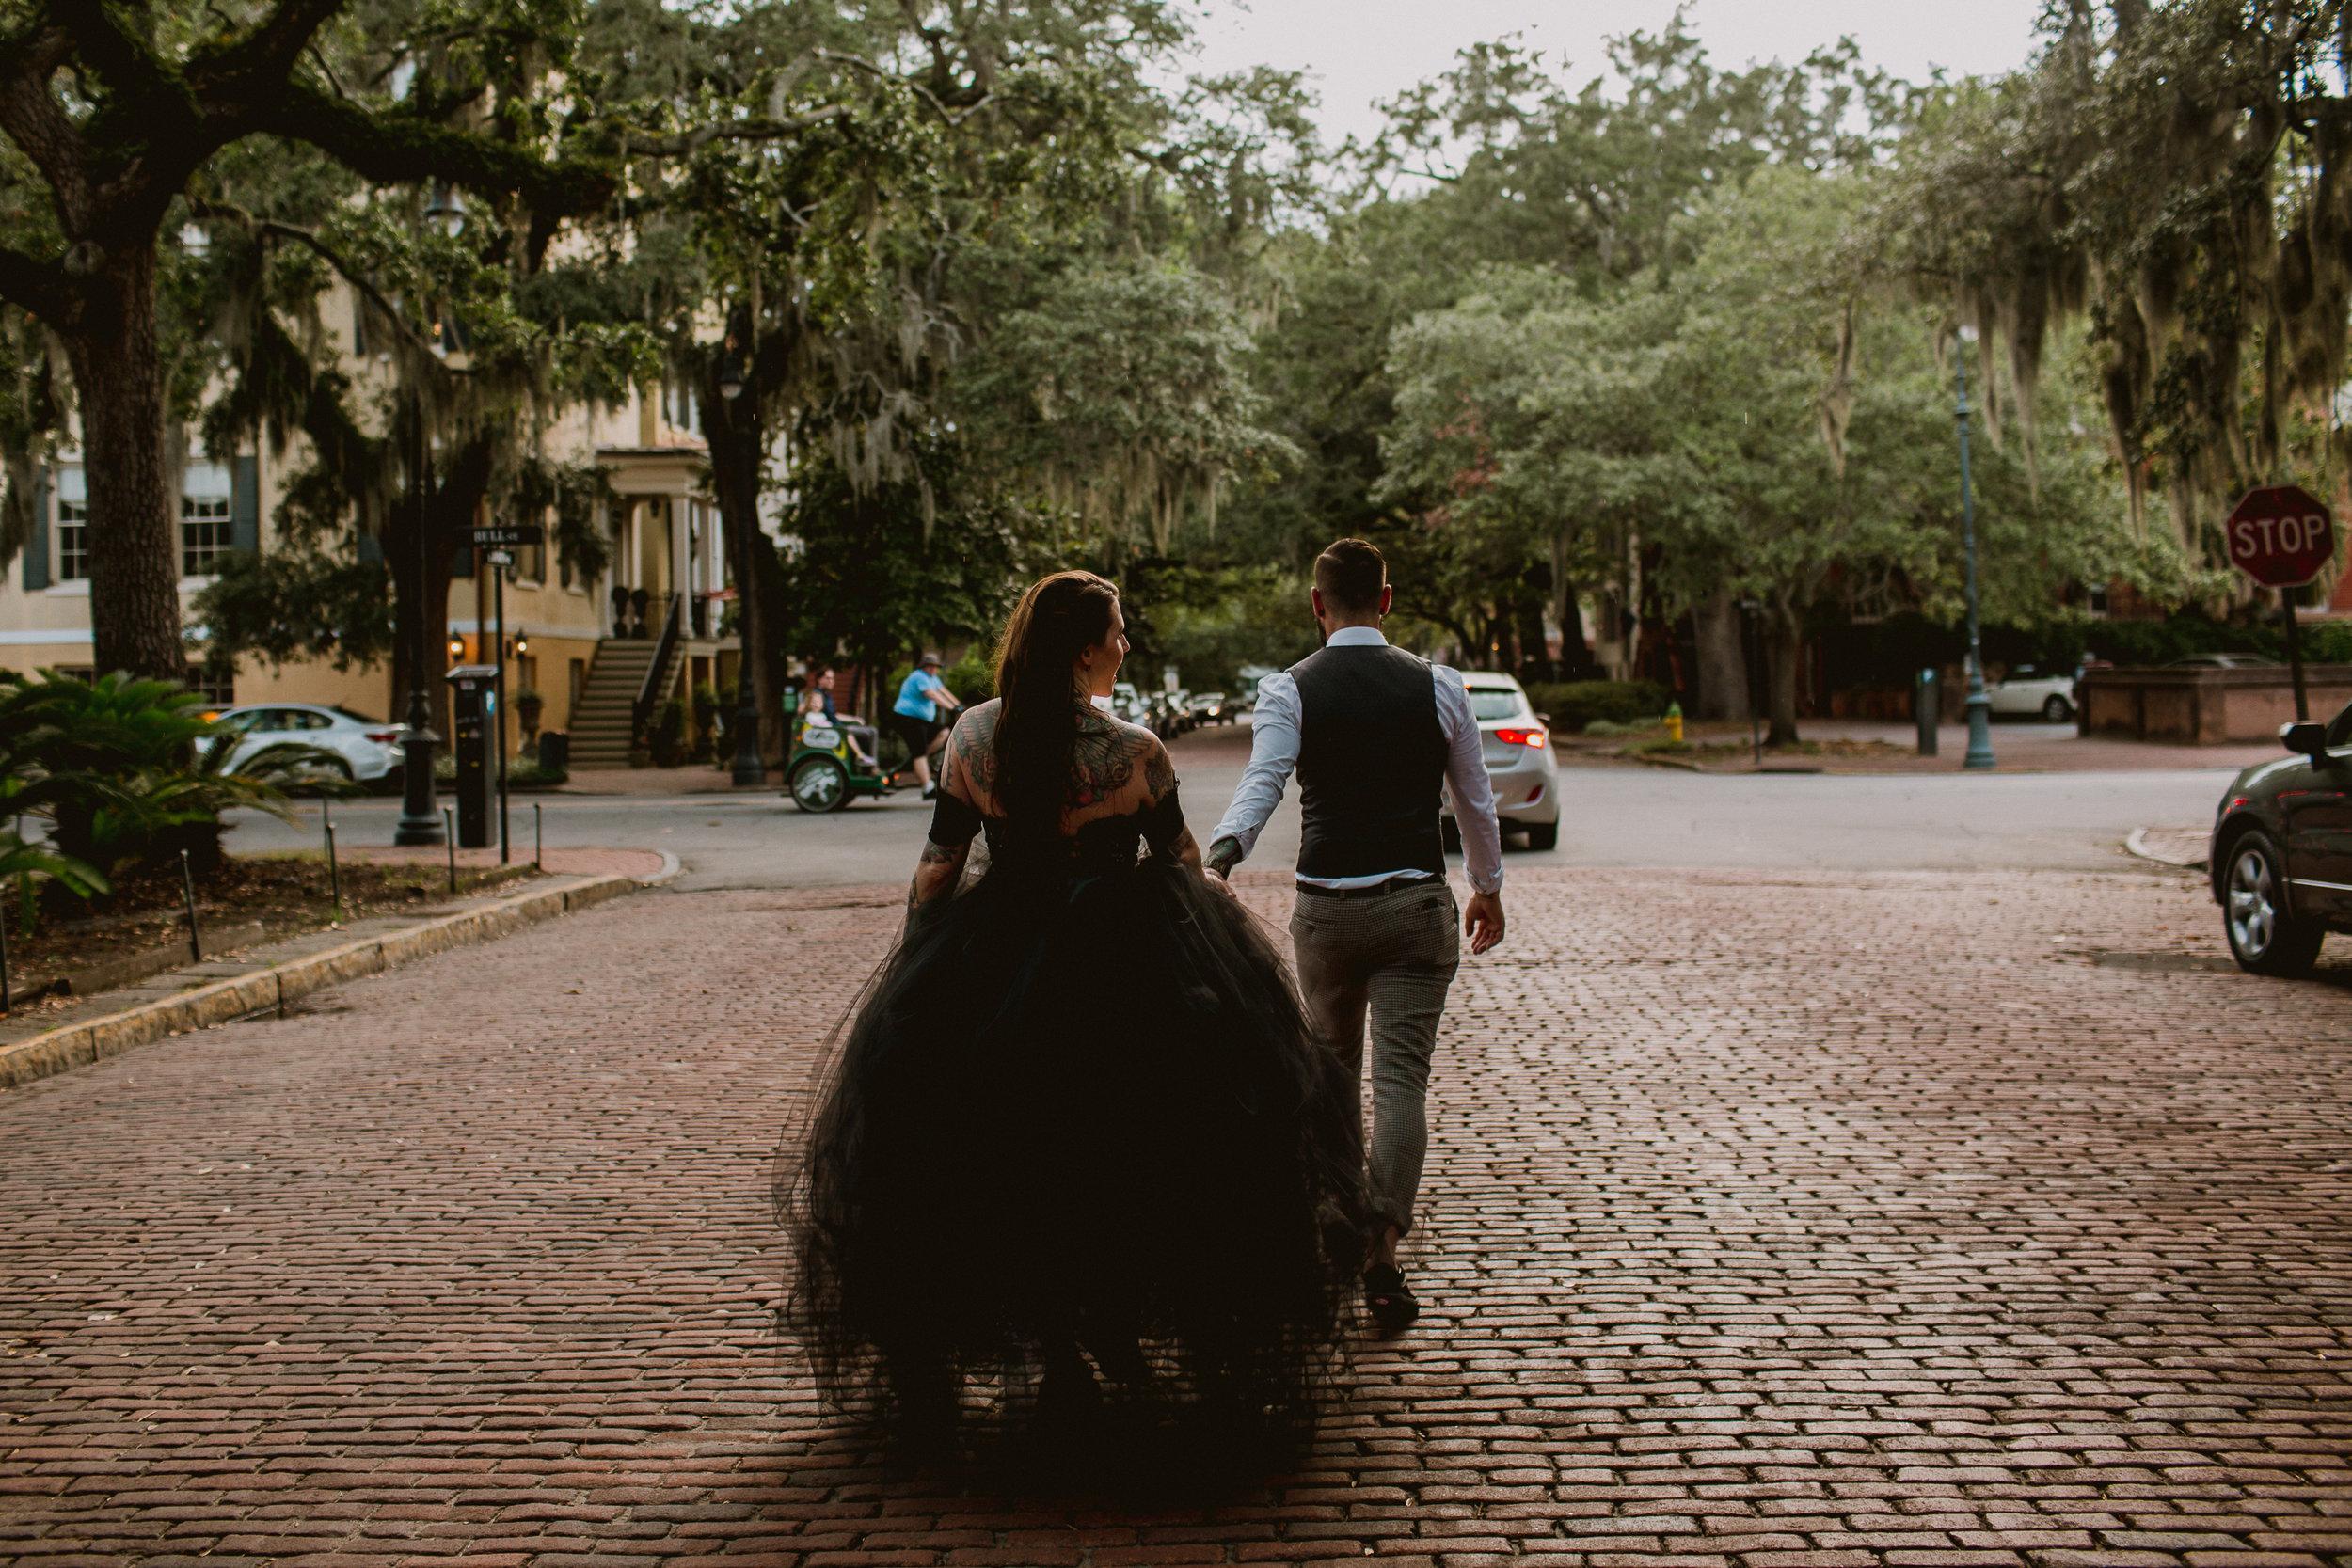 bohemian-hotel-savannah-elopement-kelley-raye-atlanta-wedding-photographer-133.jpg